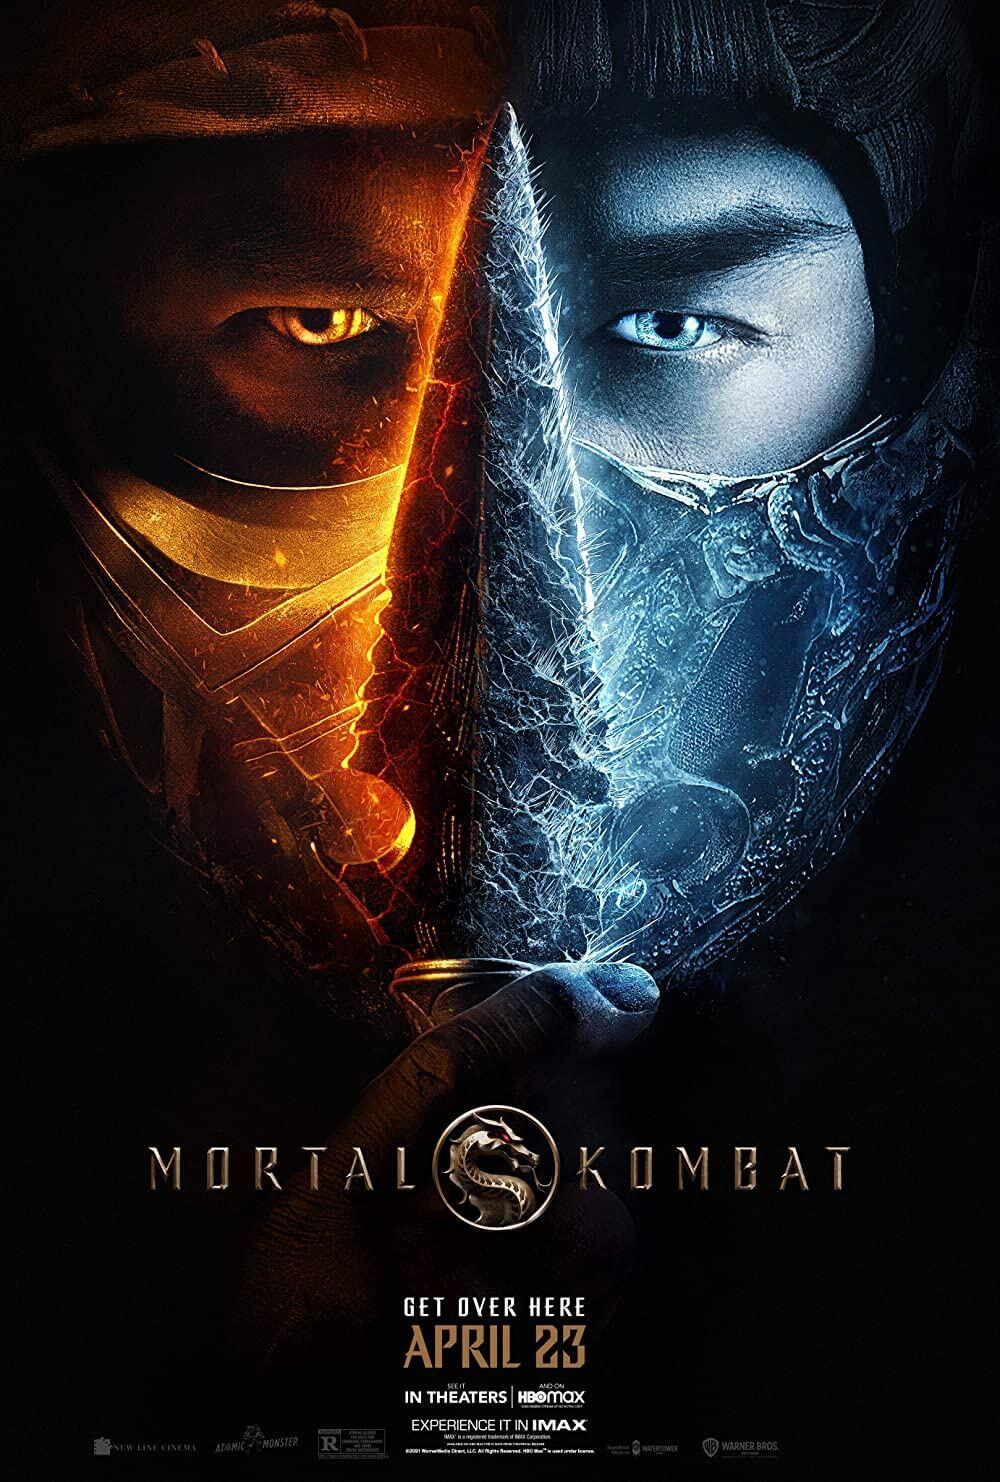 Poster phim Mortal Kombat (Cuộc Chiến Sinh Tử)